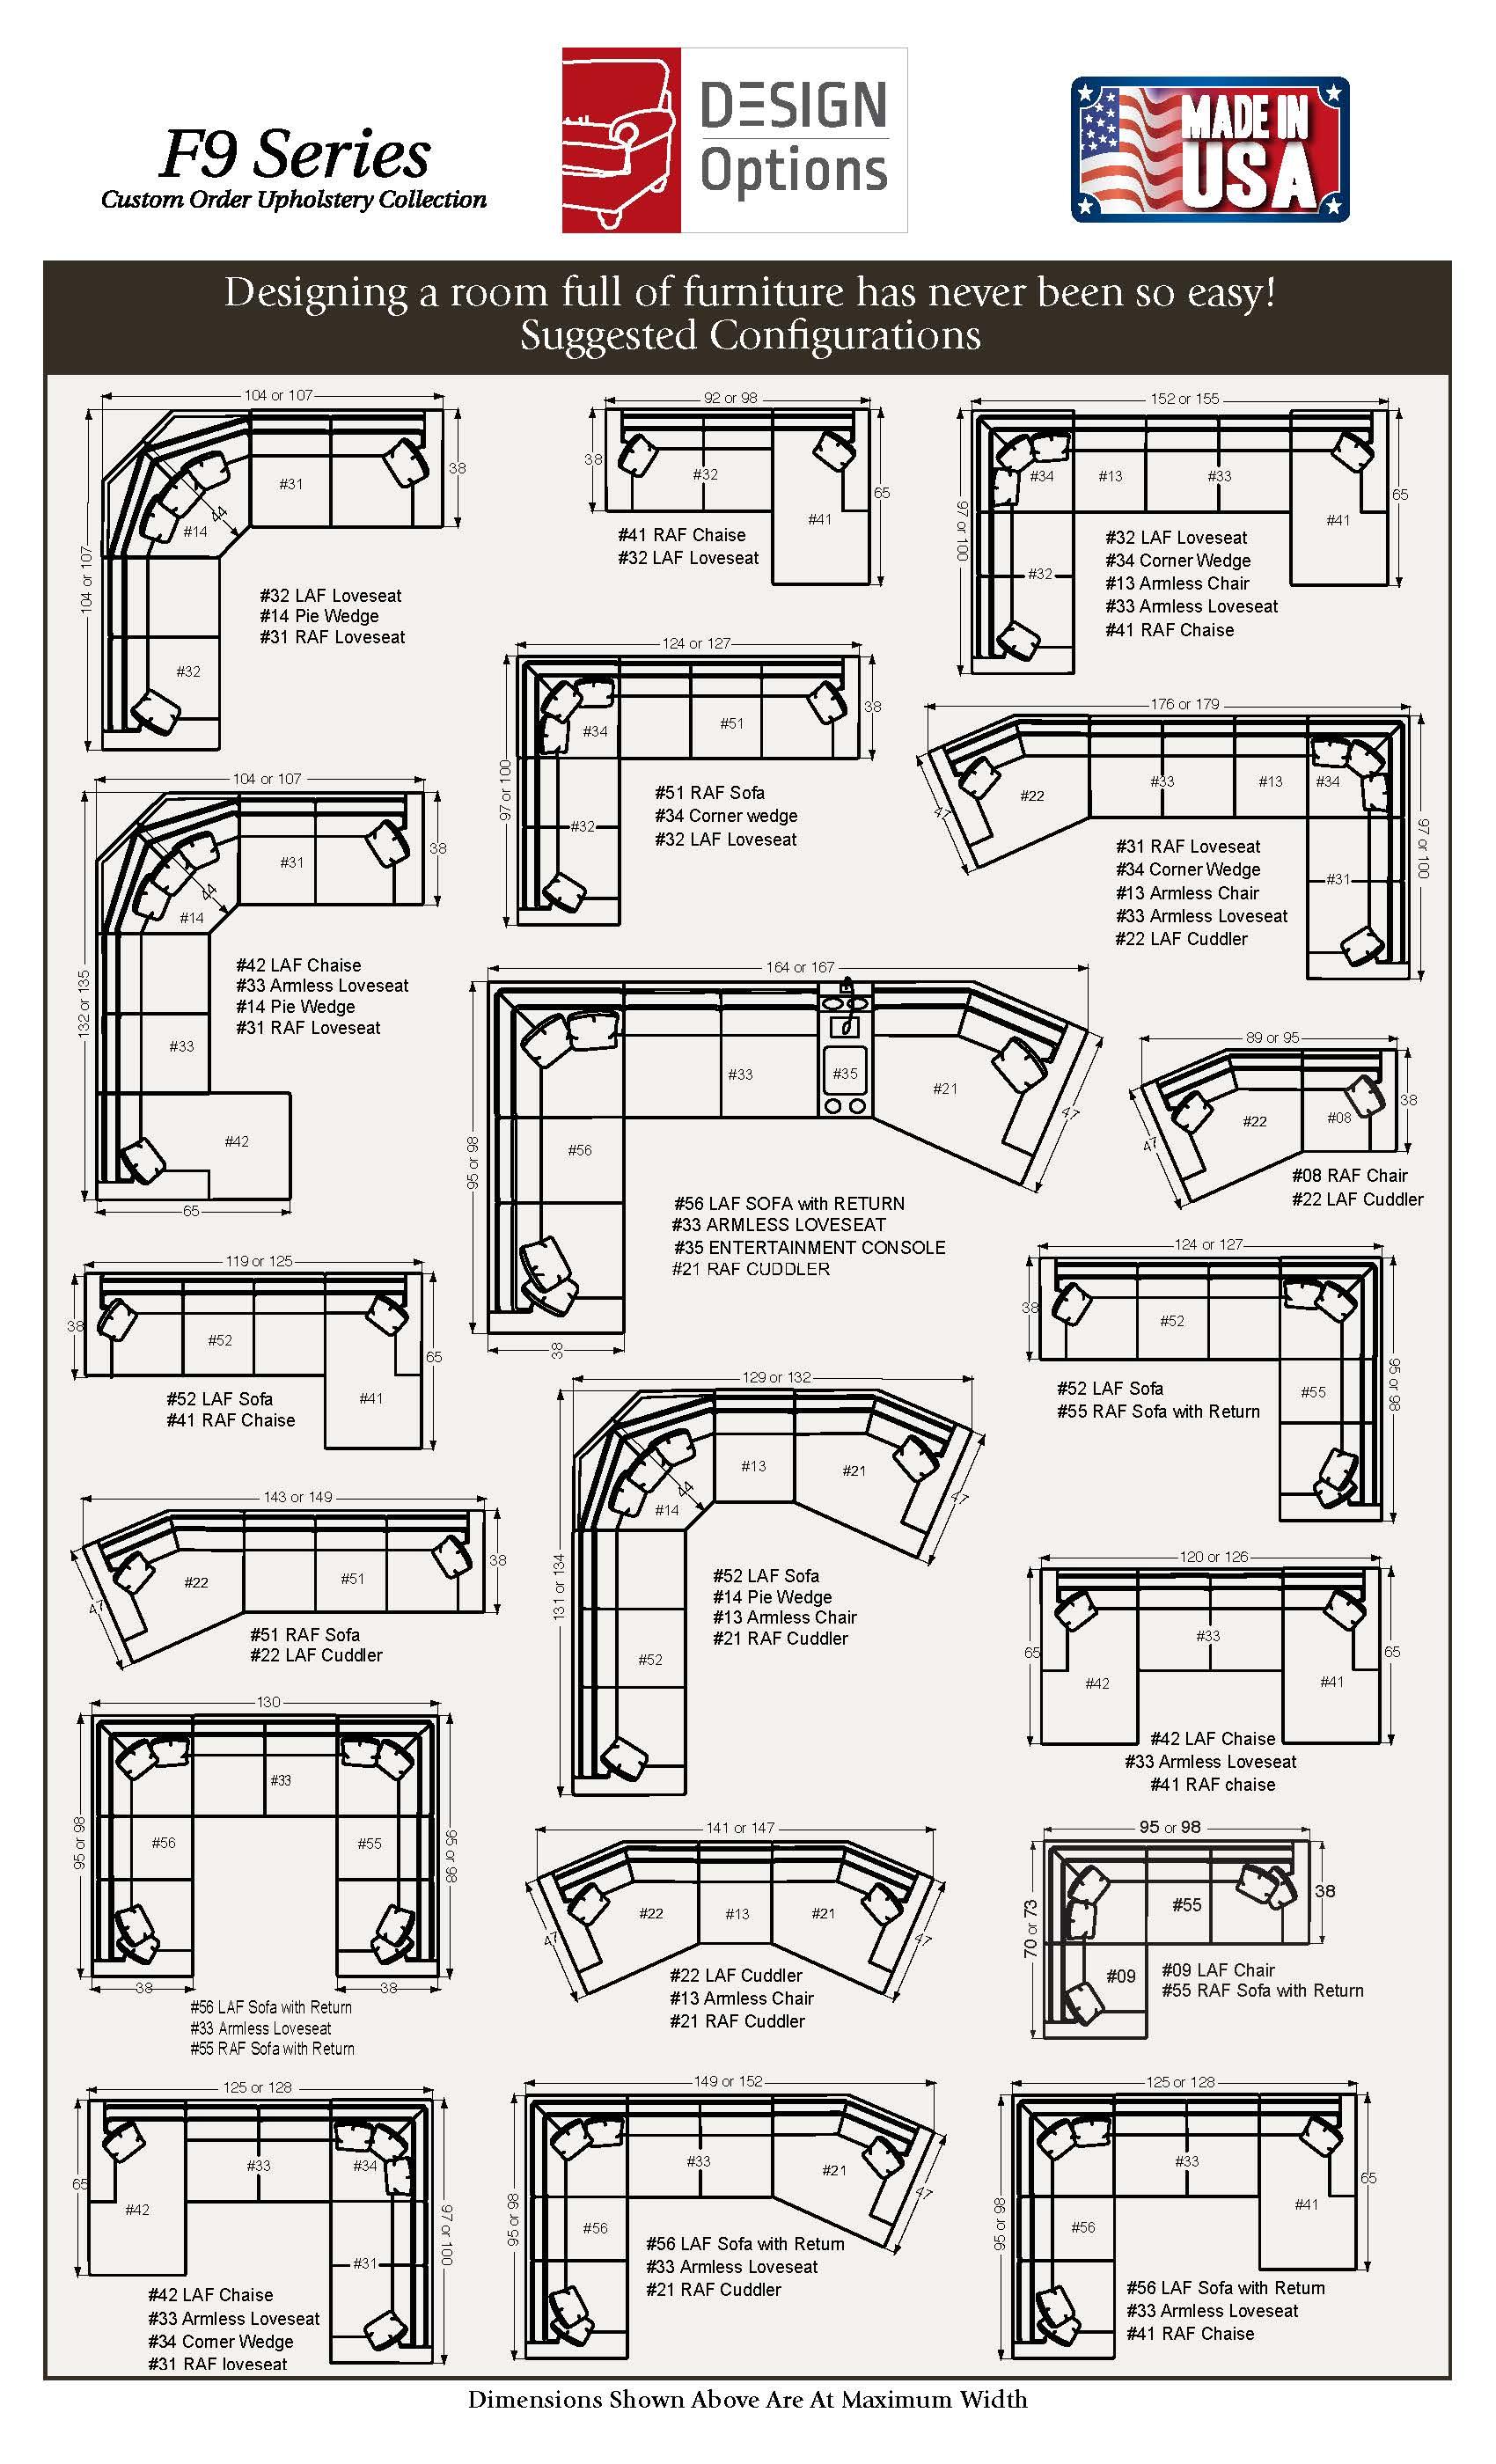 F9 Series Schematic TearPad-lr_Page_2.jpg